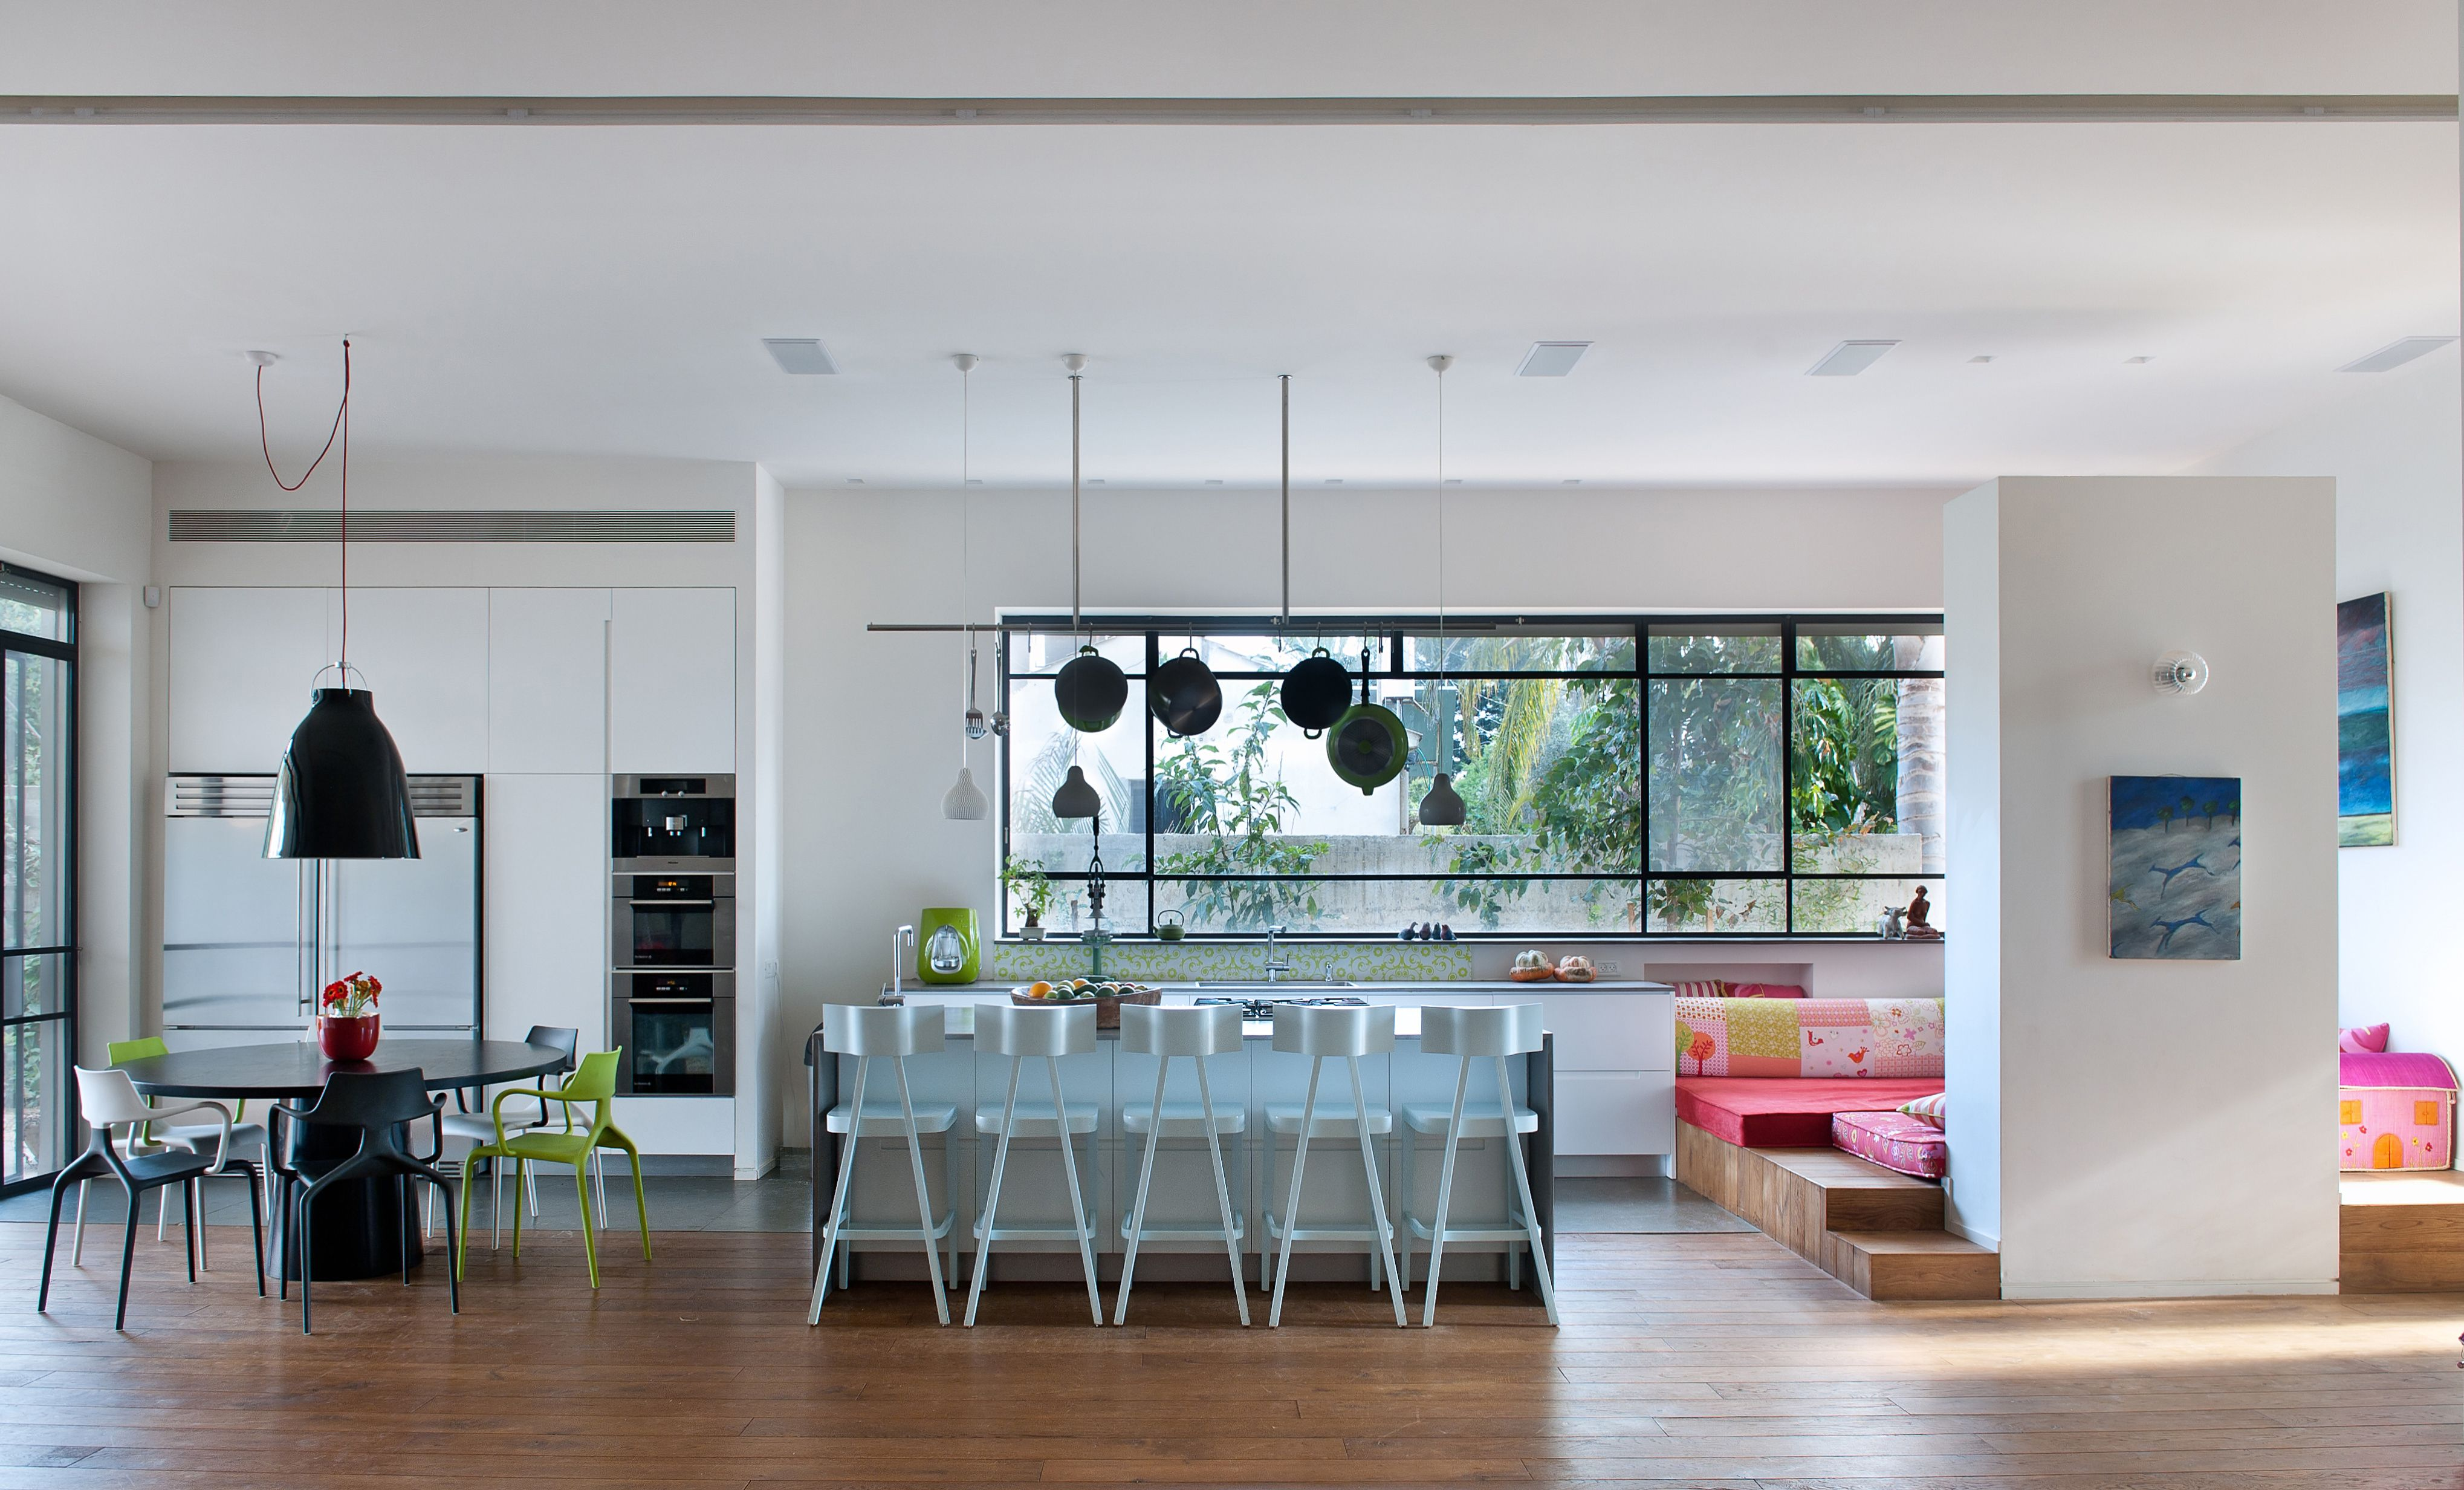 Cabinet D Architecte Nice חלון פרופיל בלגי ברזל גדול במטבח. תובל-מינימל | contemporary